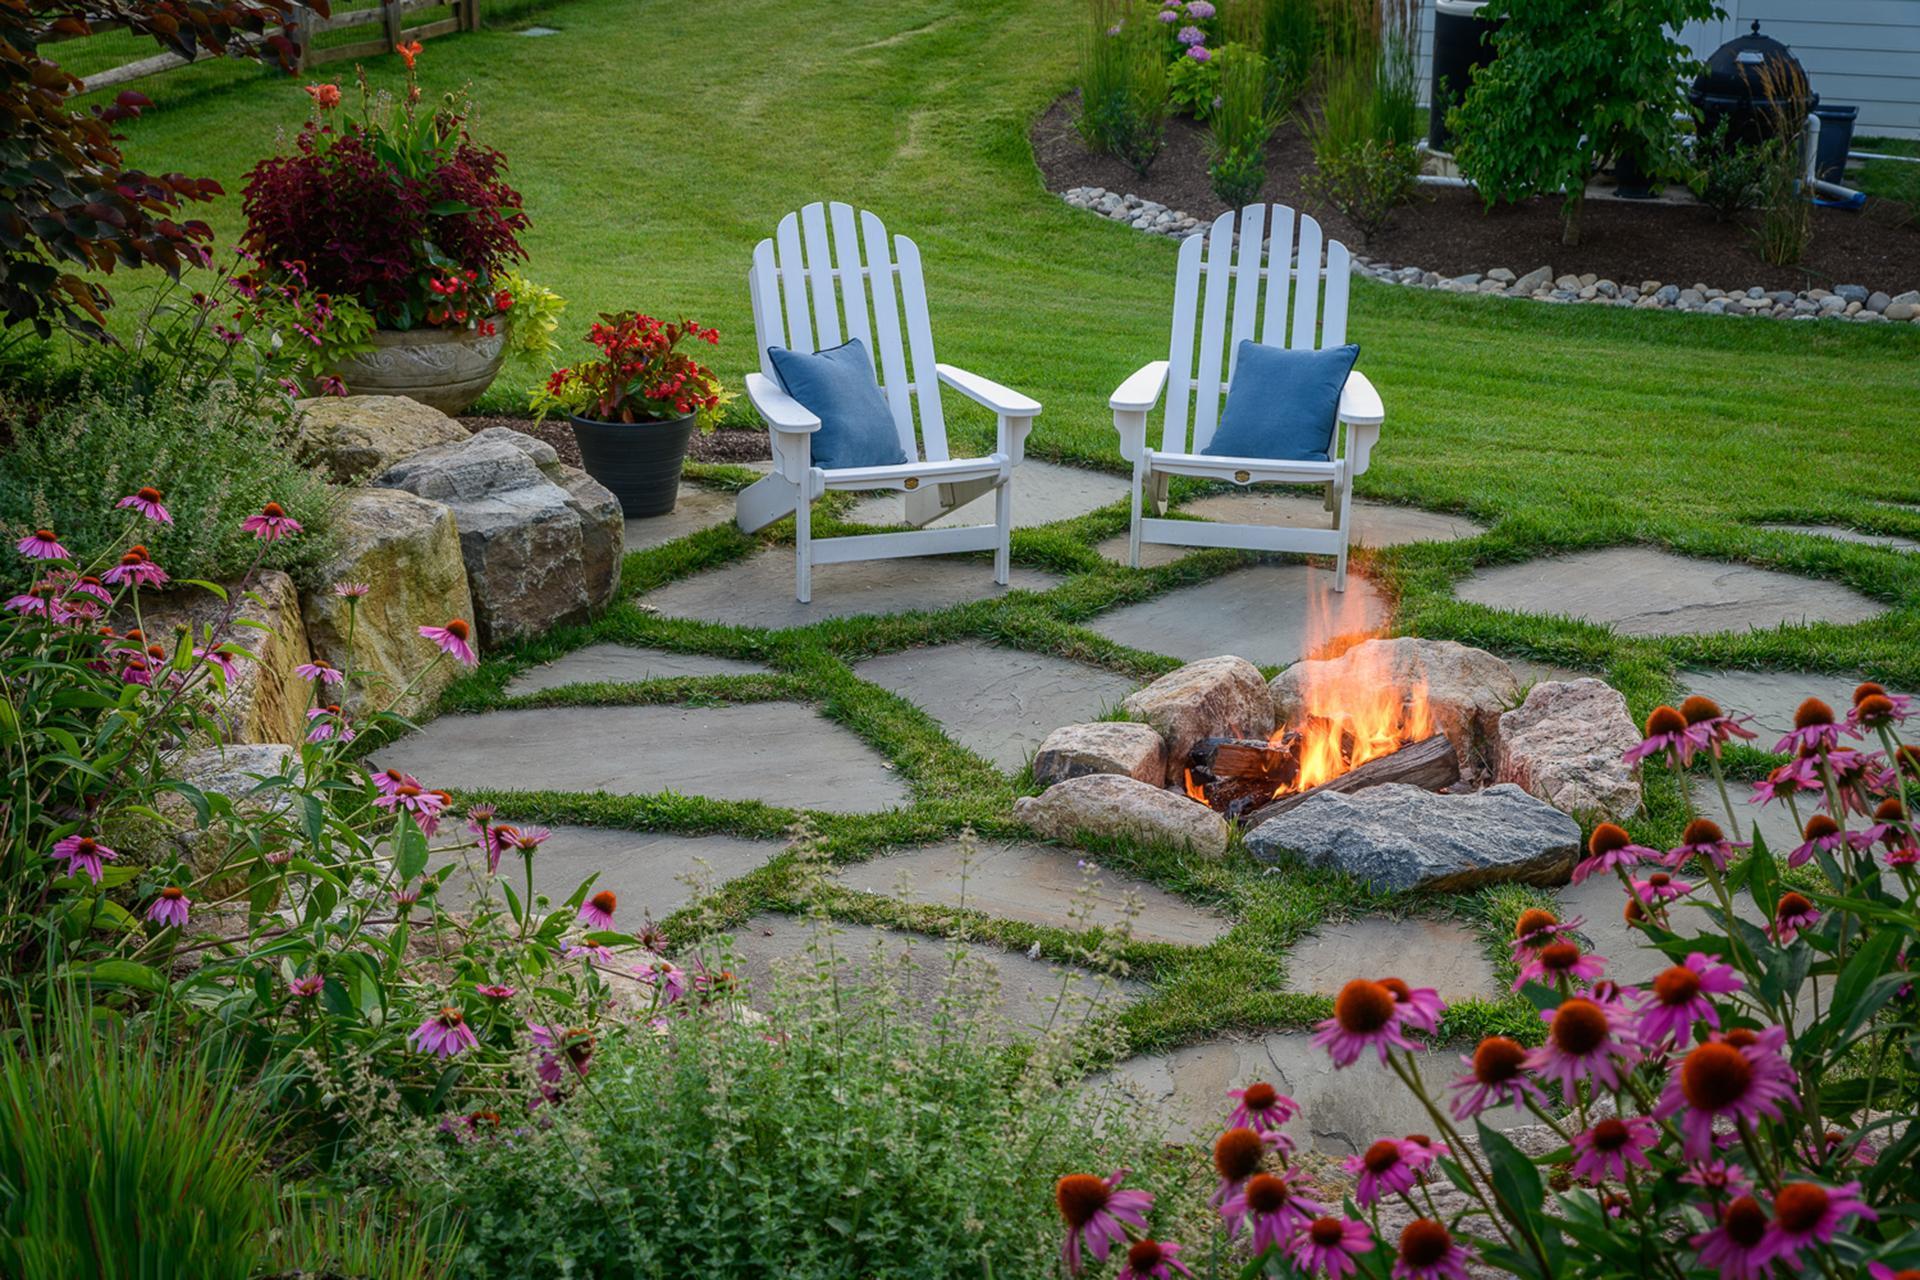 main-line-pa-outdoor-firepit-landscape-design